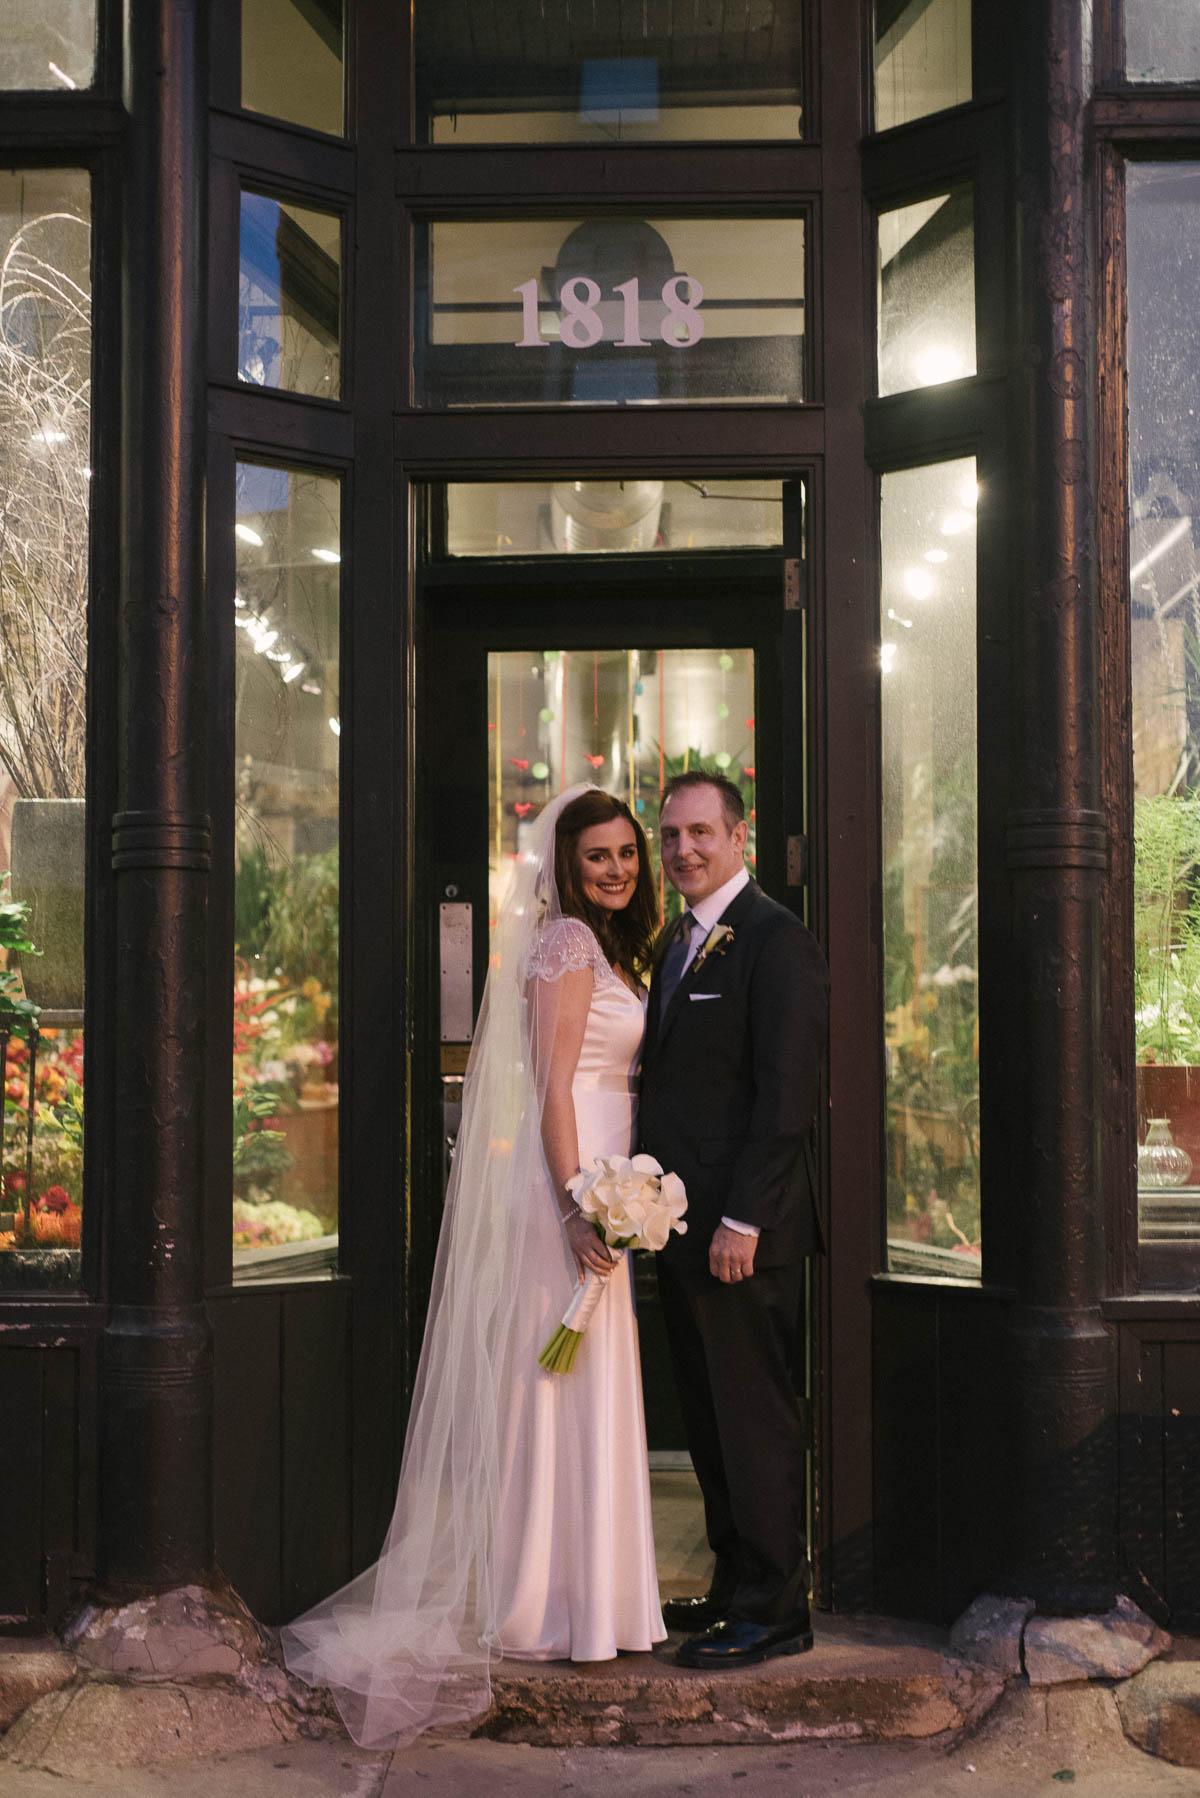 Pamela Yasuko Photography - A New Leaf Wedding - Chicago Oahu Photographer-44.jpg